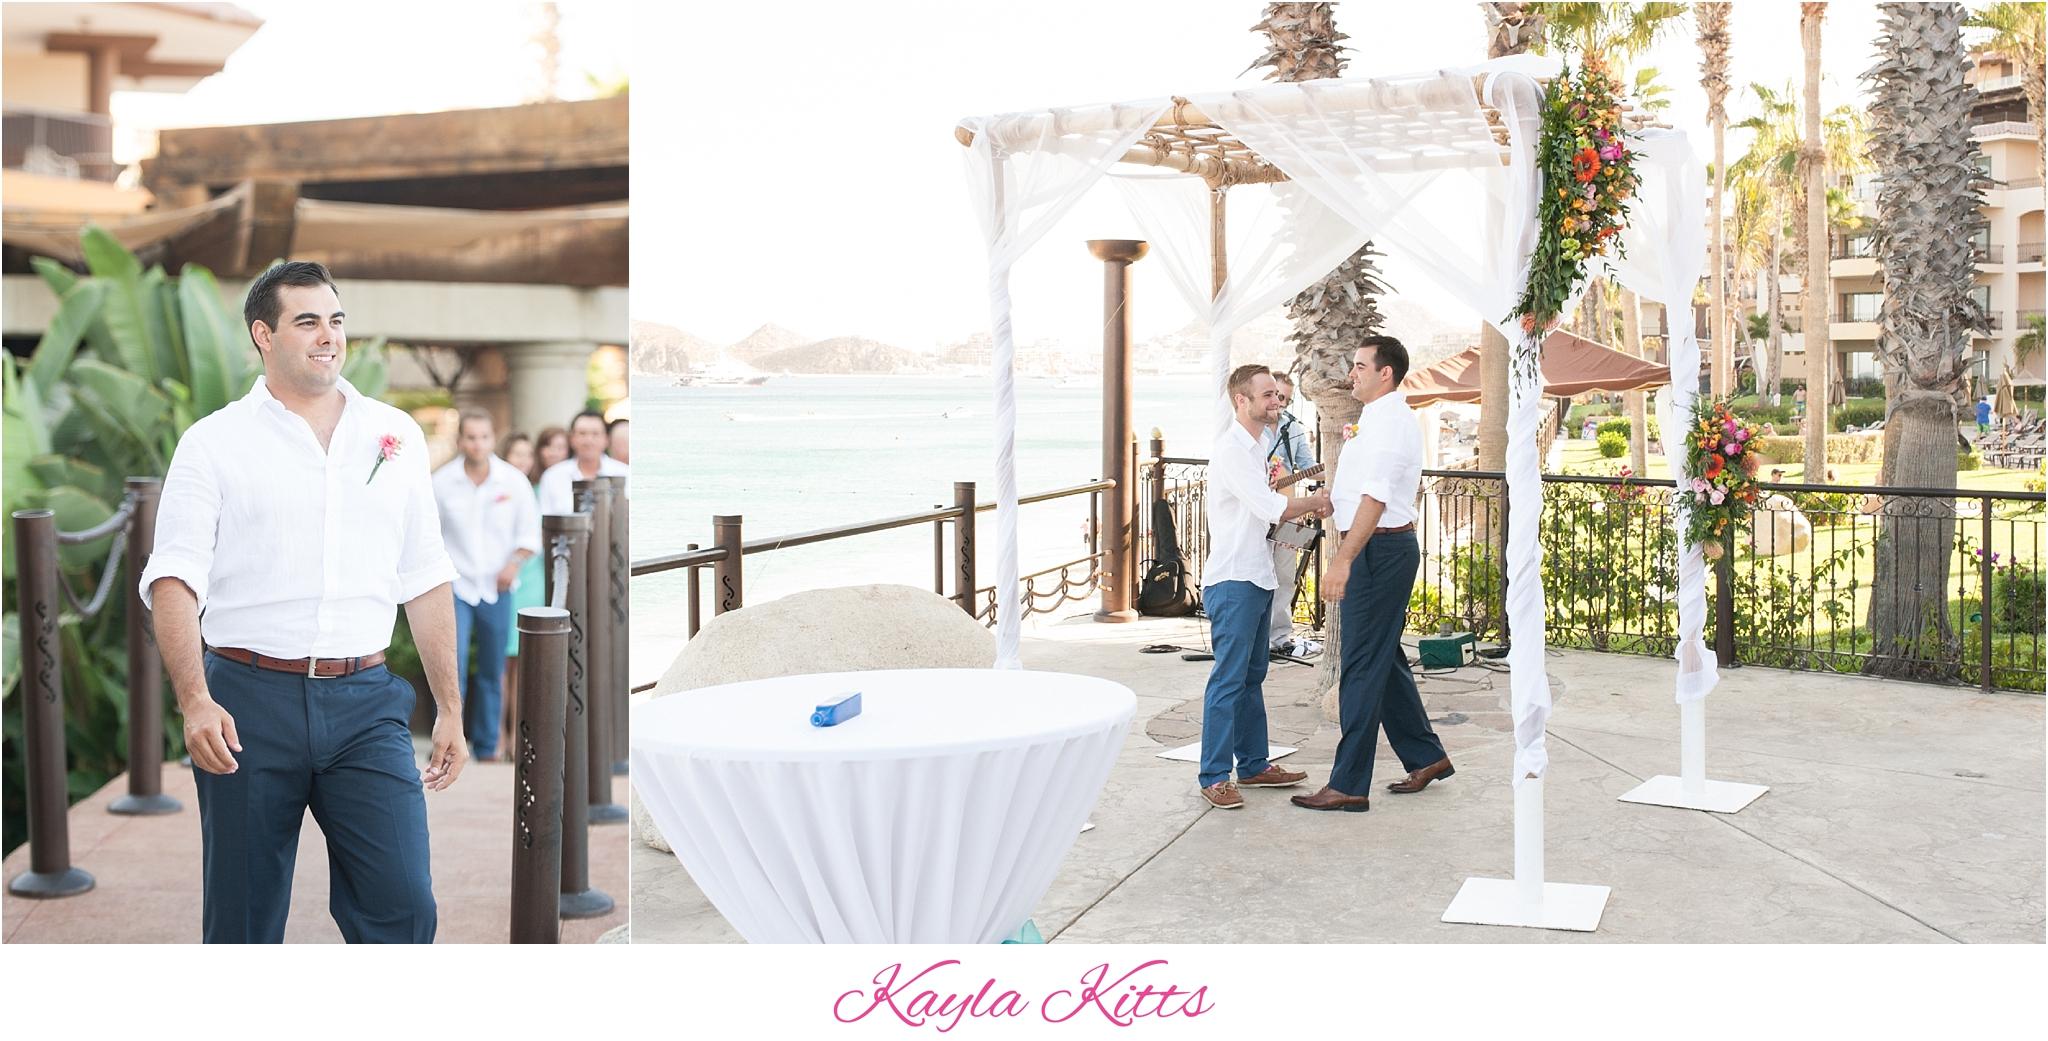 kayla kitts photography-travis and sarah-cabo wedding-cabo wedding photographer-destination wedding photographer-paris wedding photographer-albuquerque wedding-matt jones-albuquerque wedding vendor-intimate wedding_0012.jpg